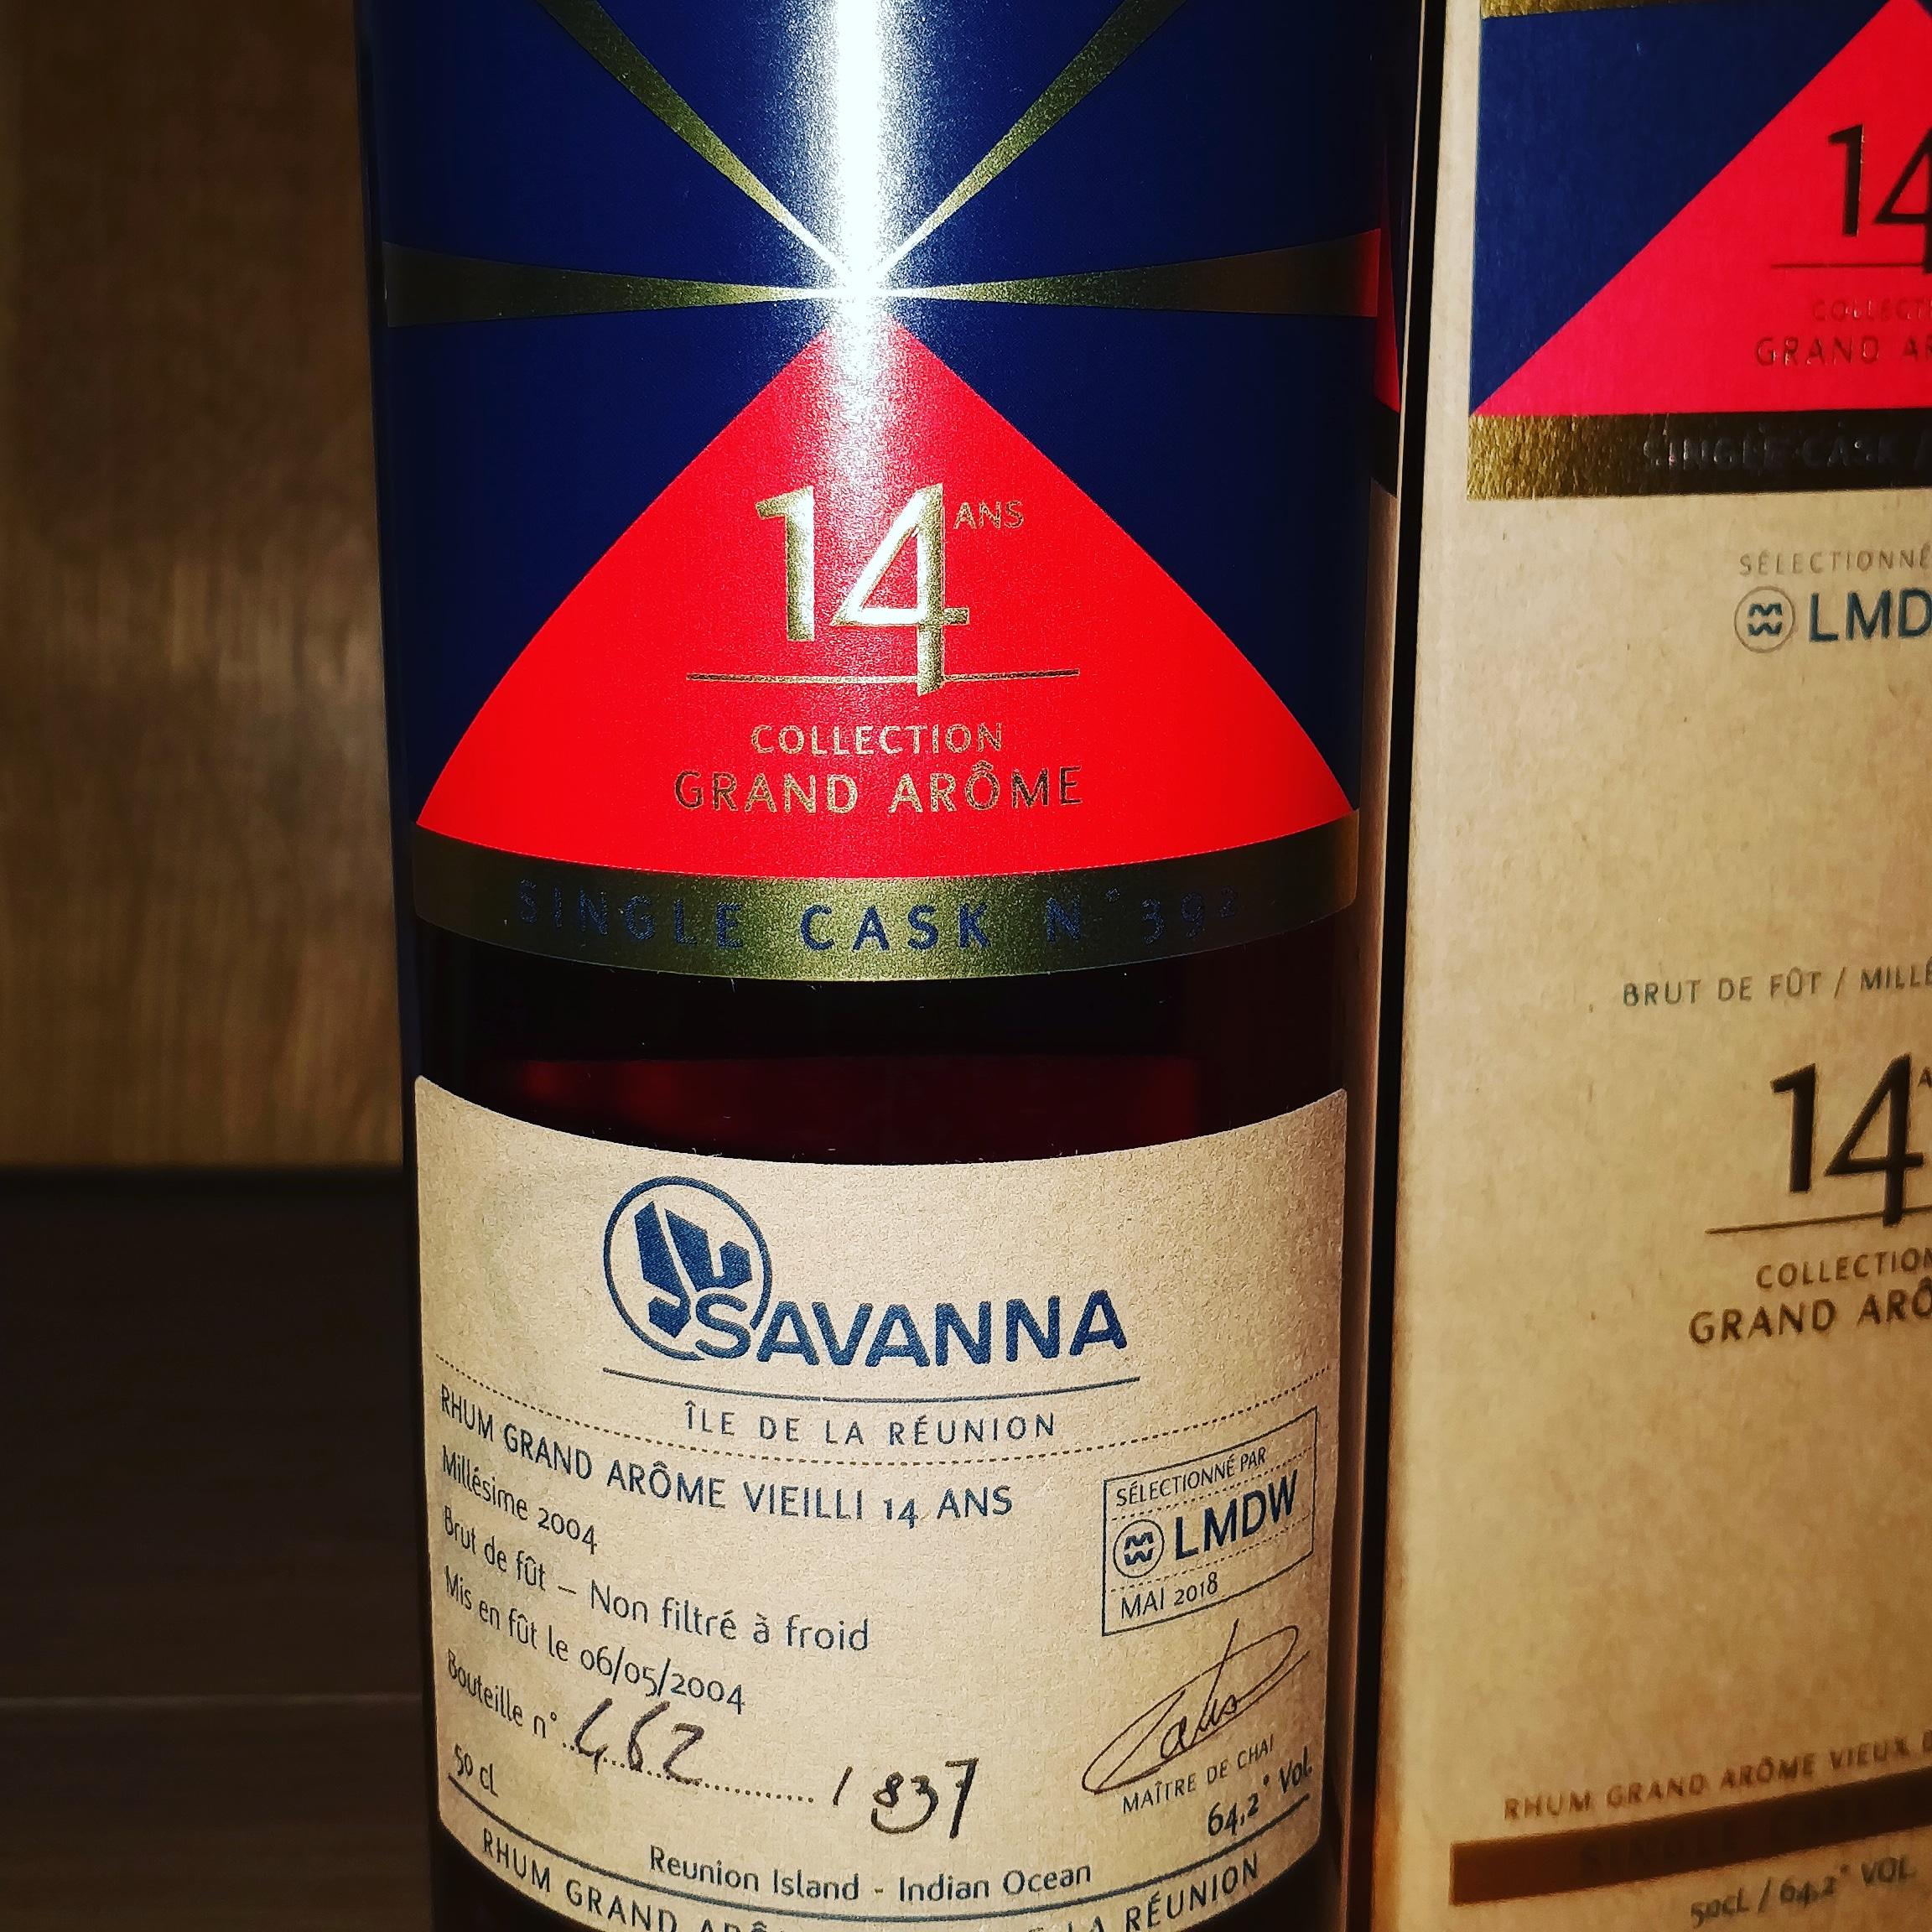 Savanna 14 ans Grand Arôme  single cask 392